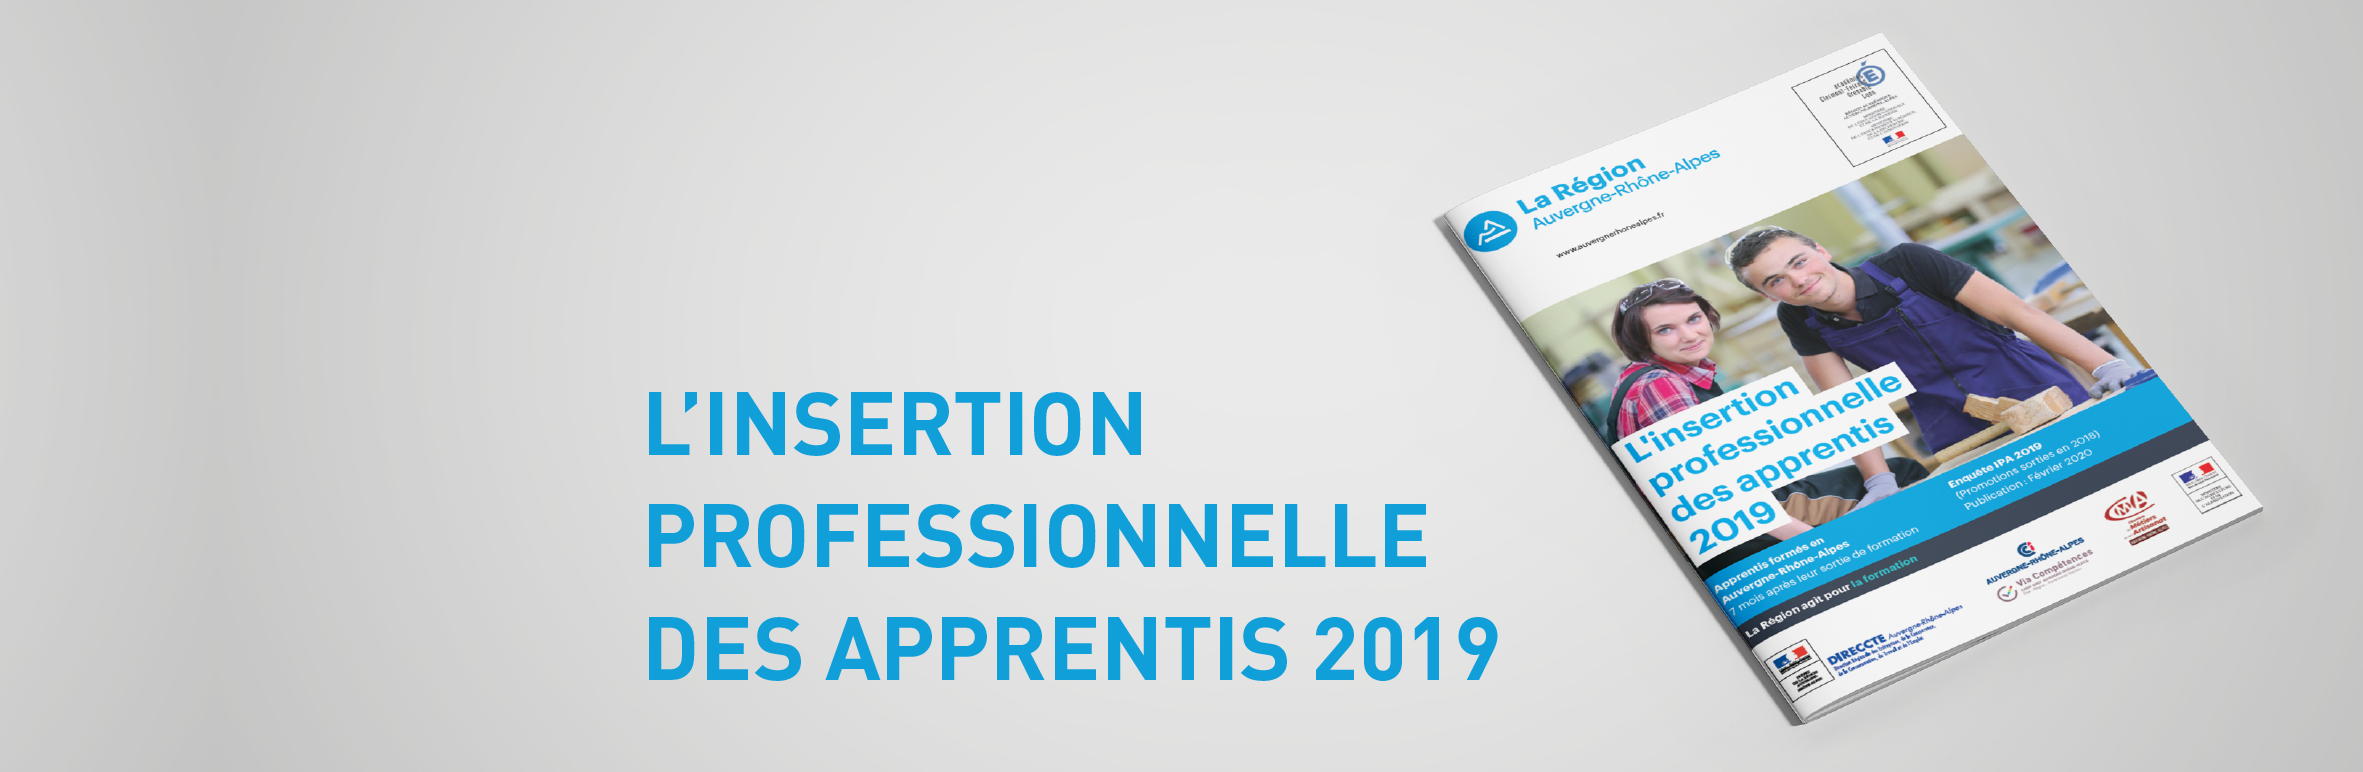 L'insertion des apprentis en Auvergne-Rhône-Alpes